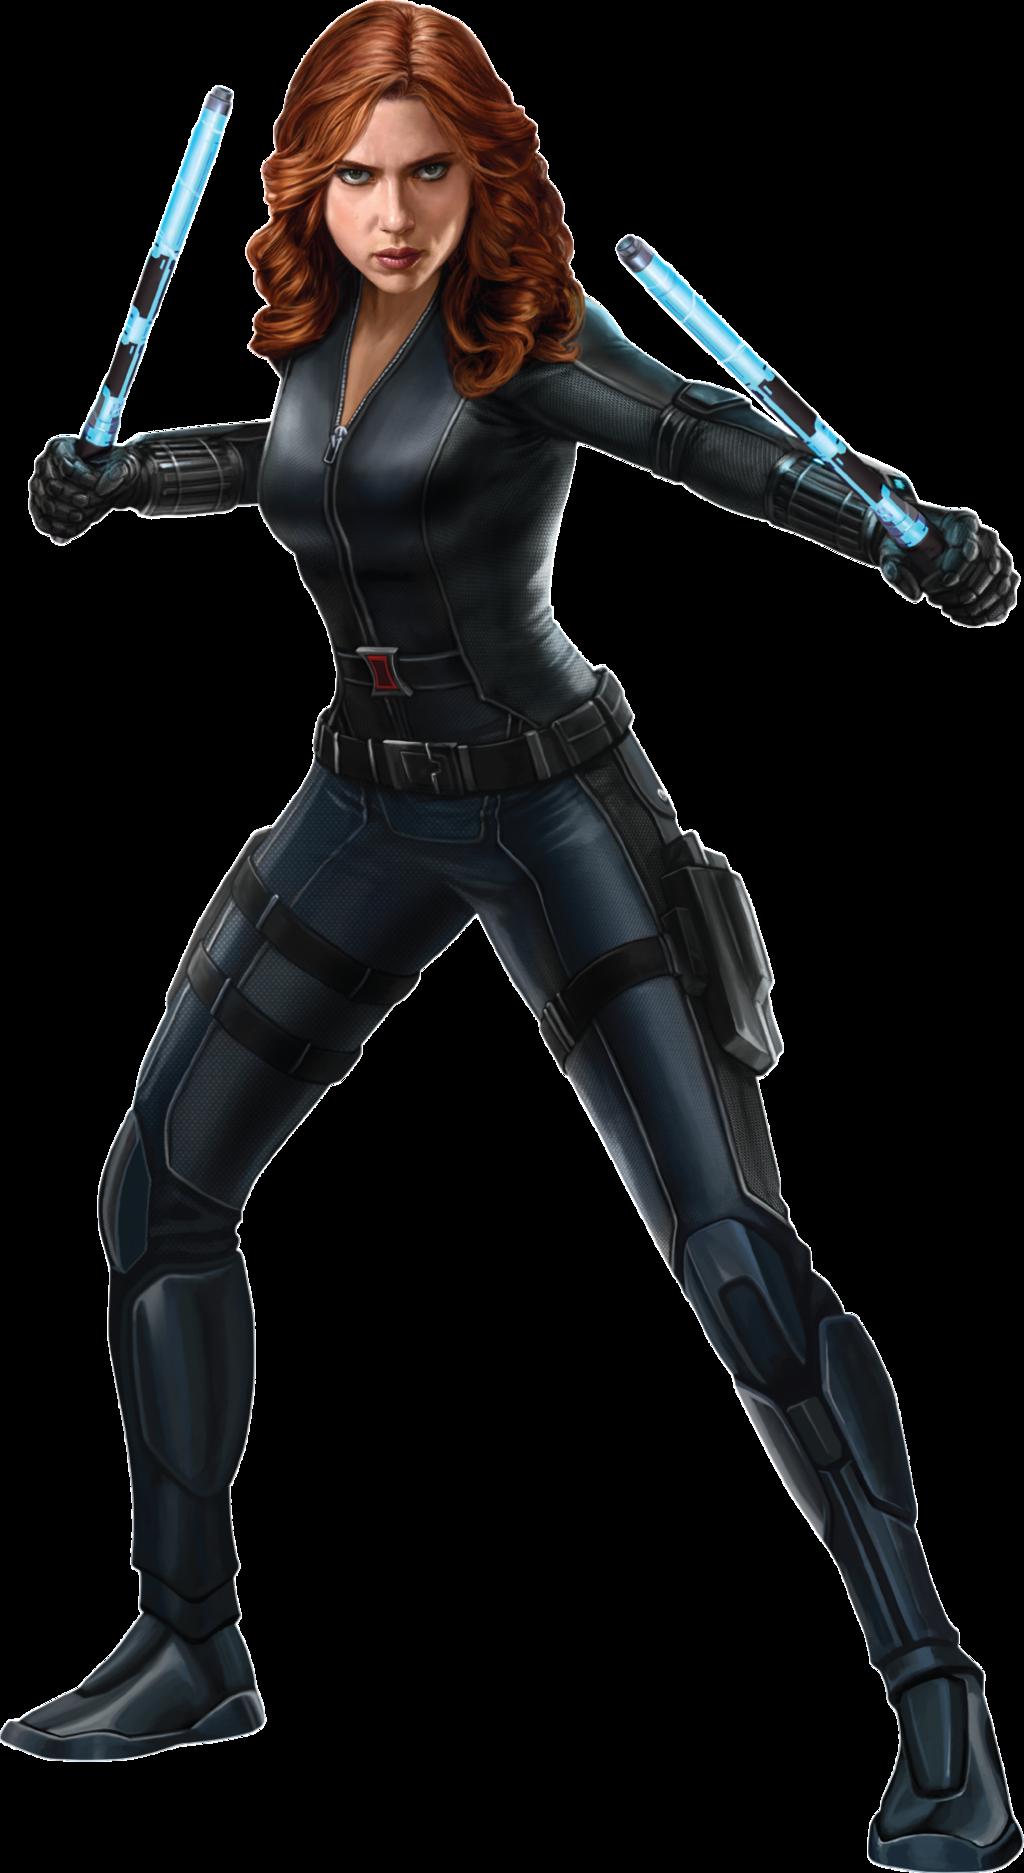 Clip art character wesomeness. Hero clipart black widow